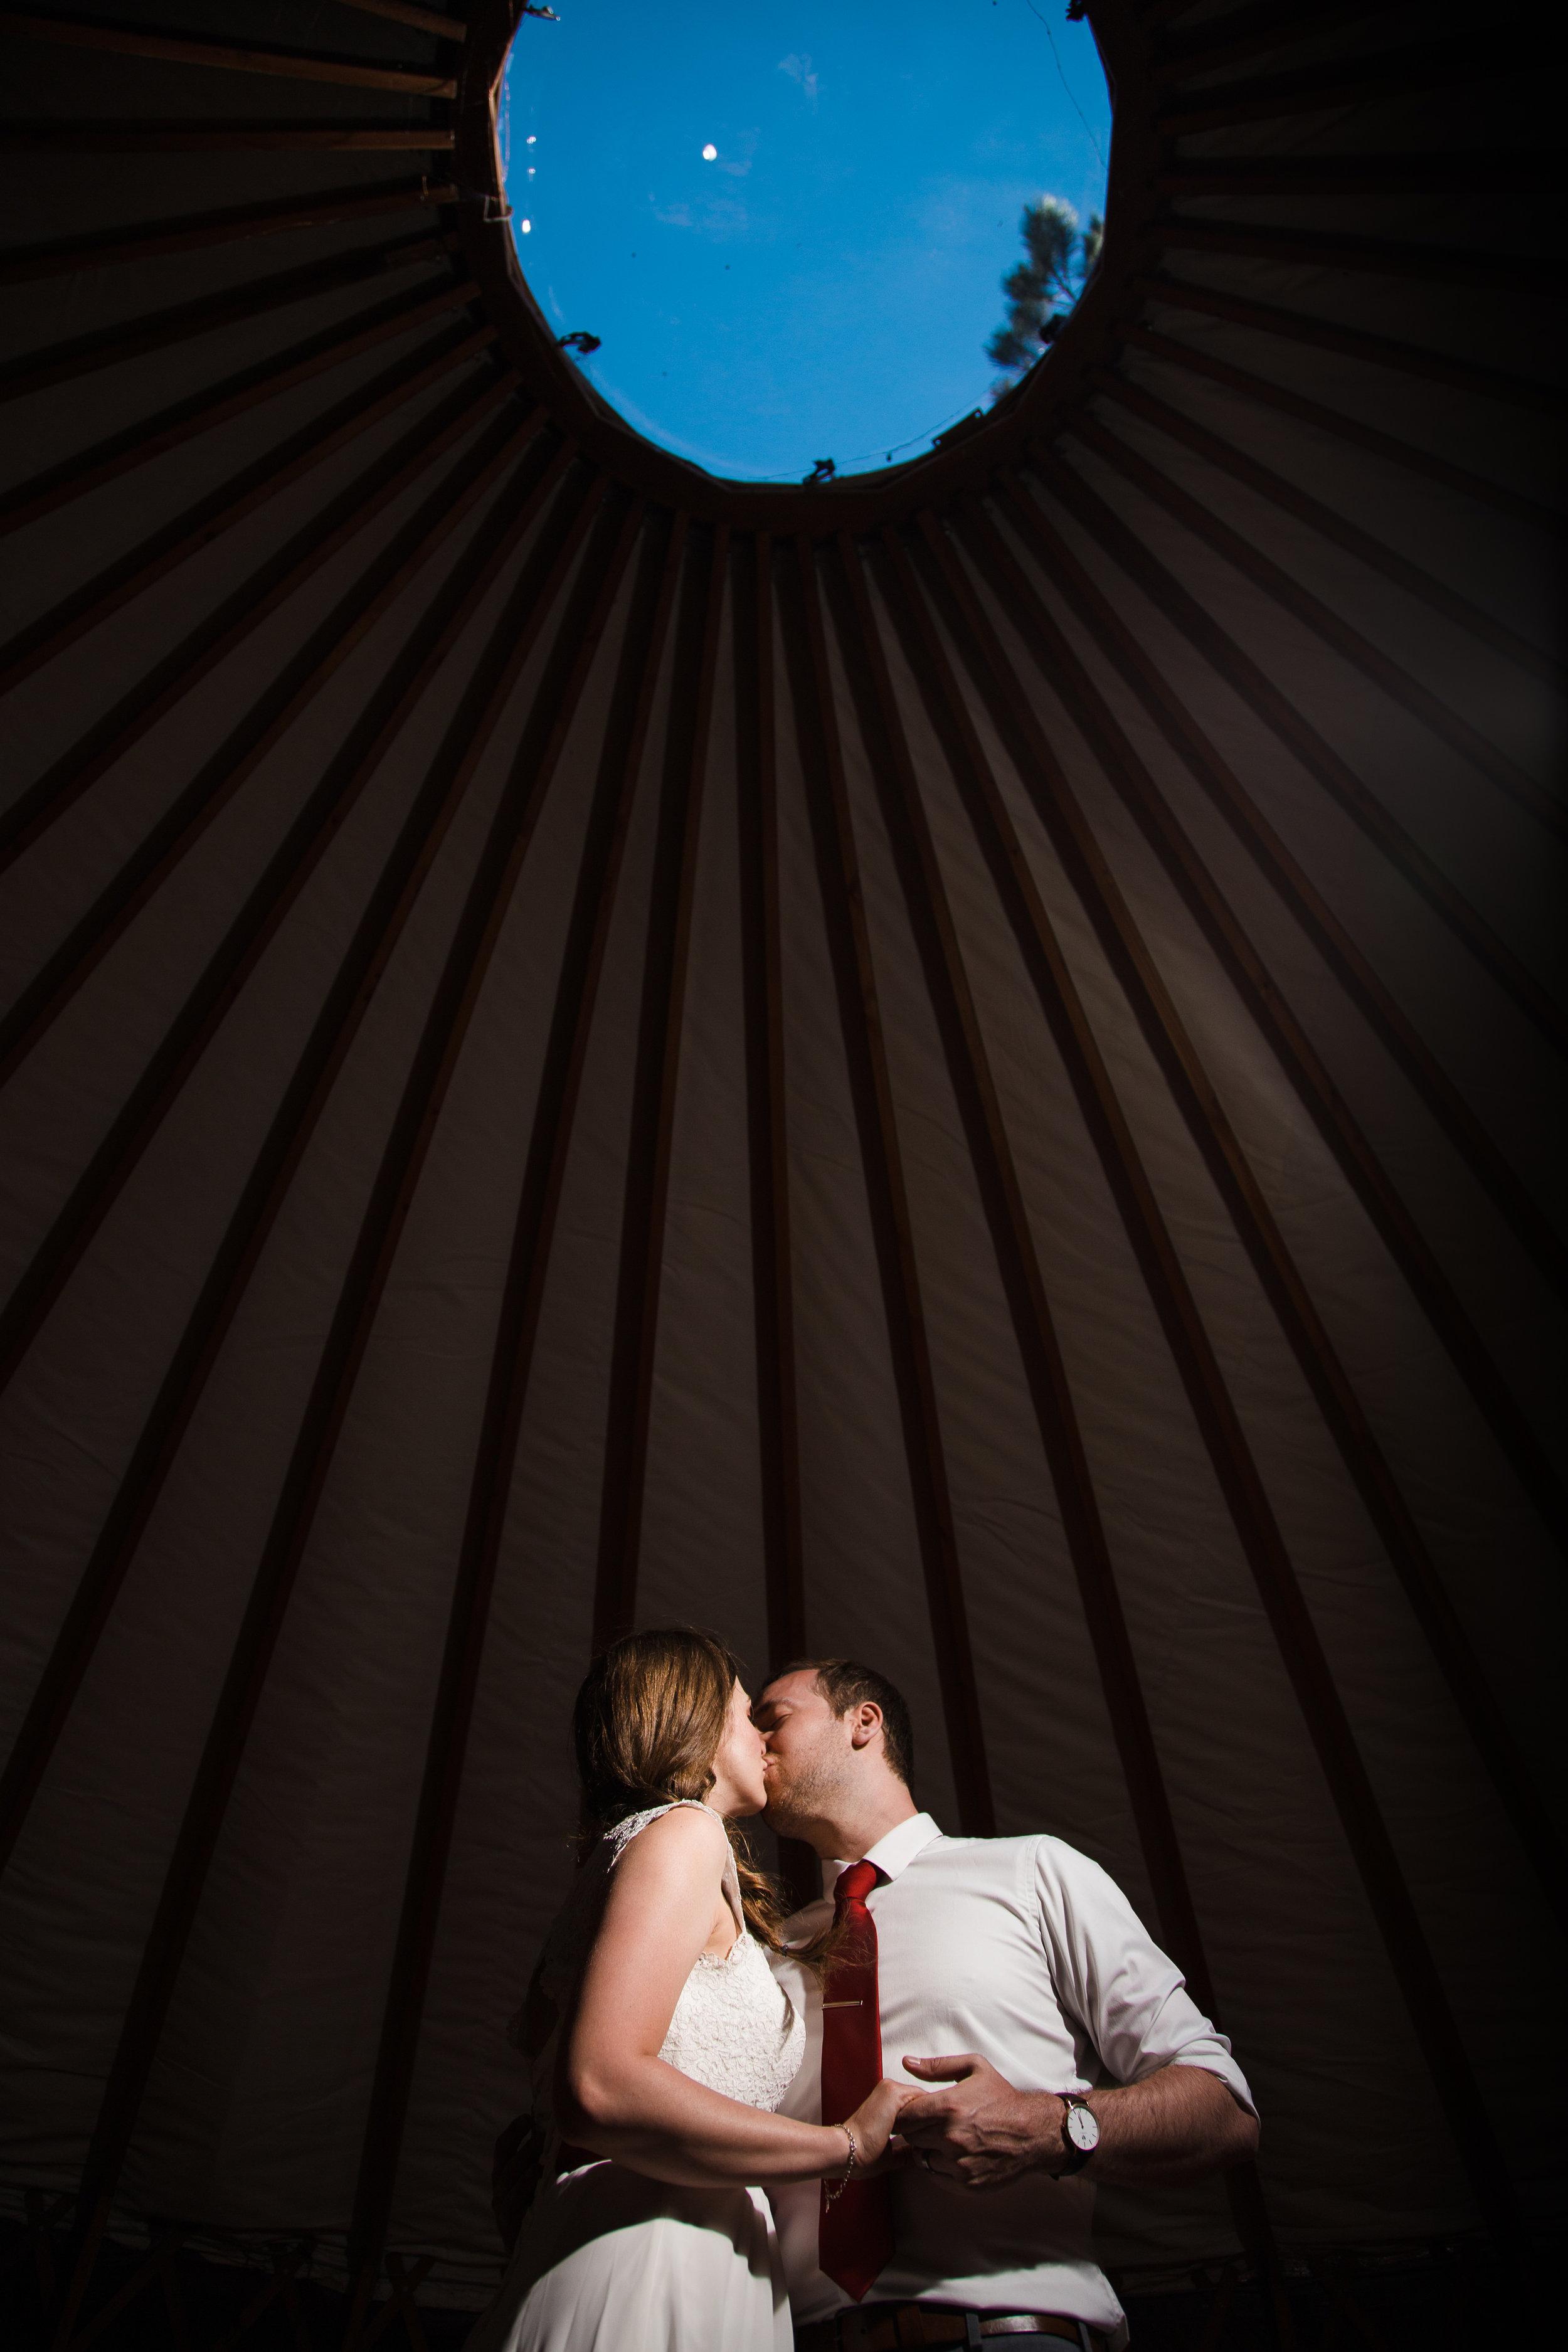 flagstaff-nordic-center-wedding-18.jpg